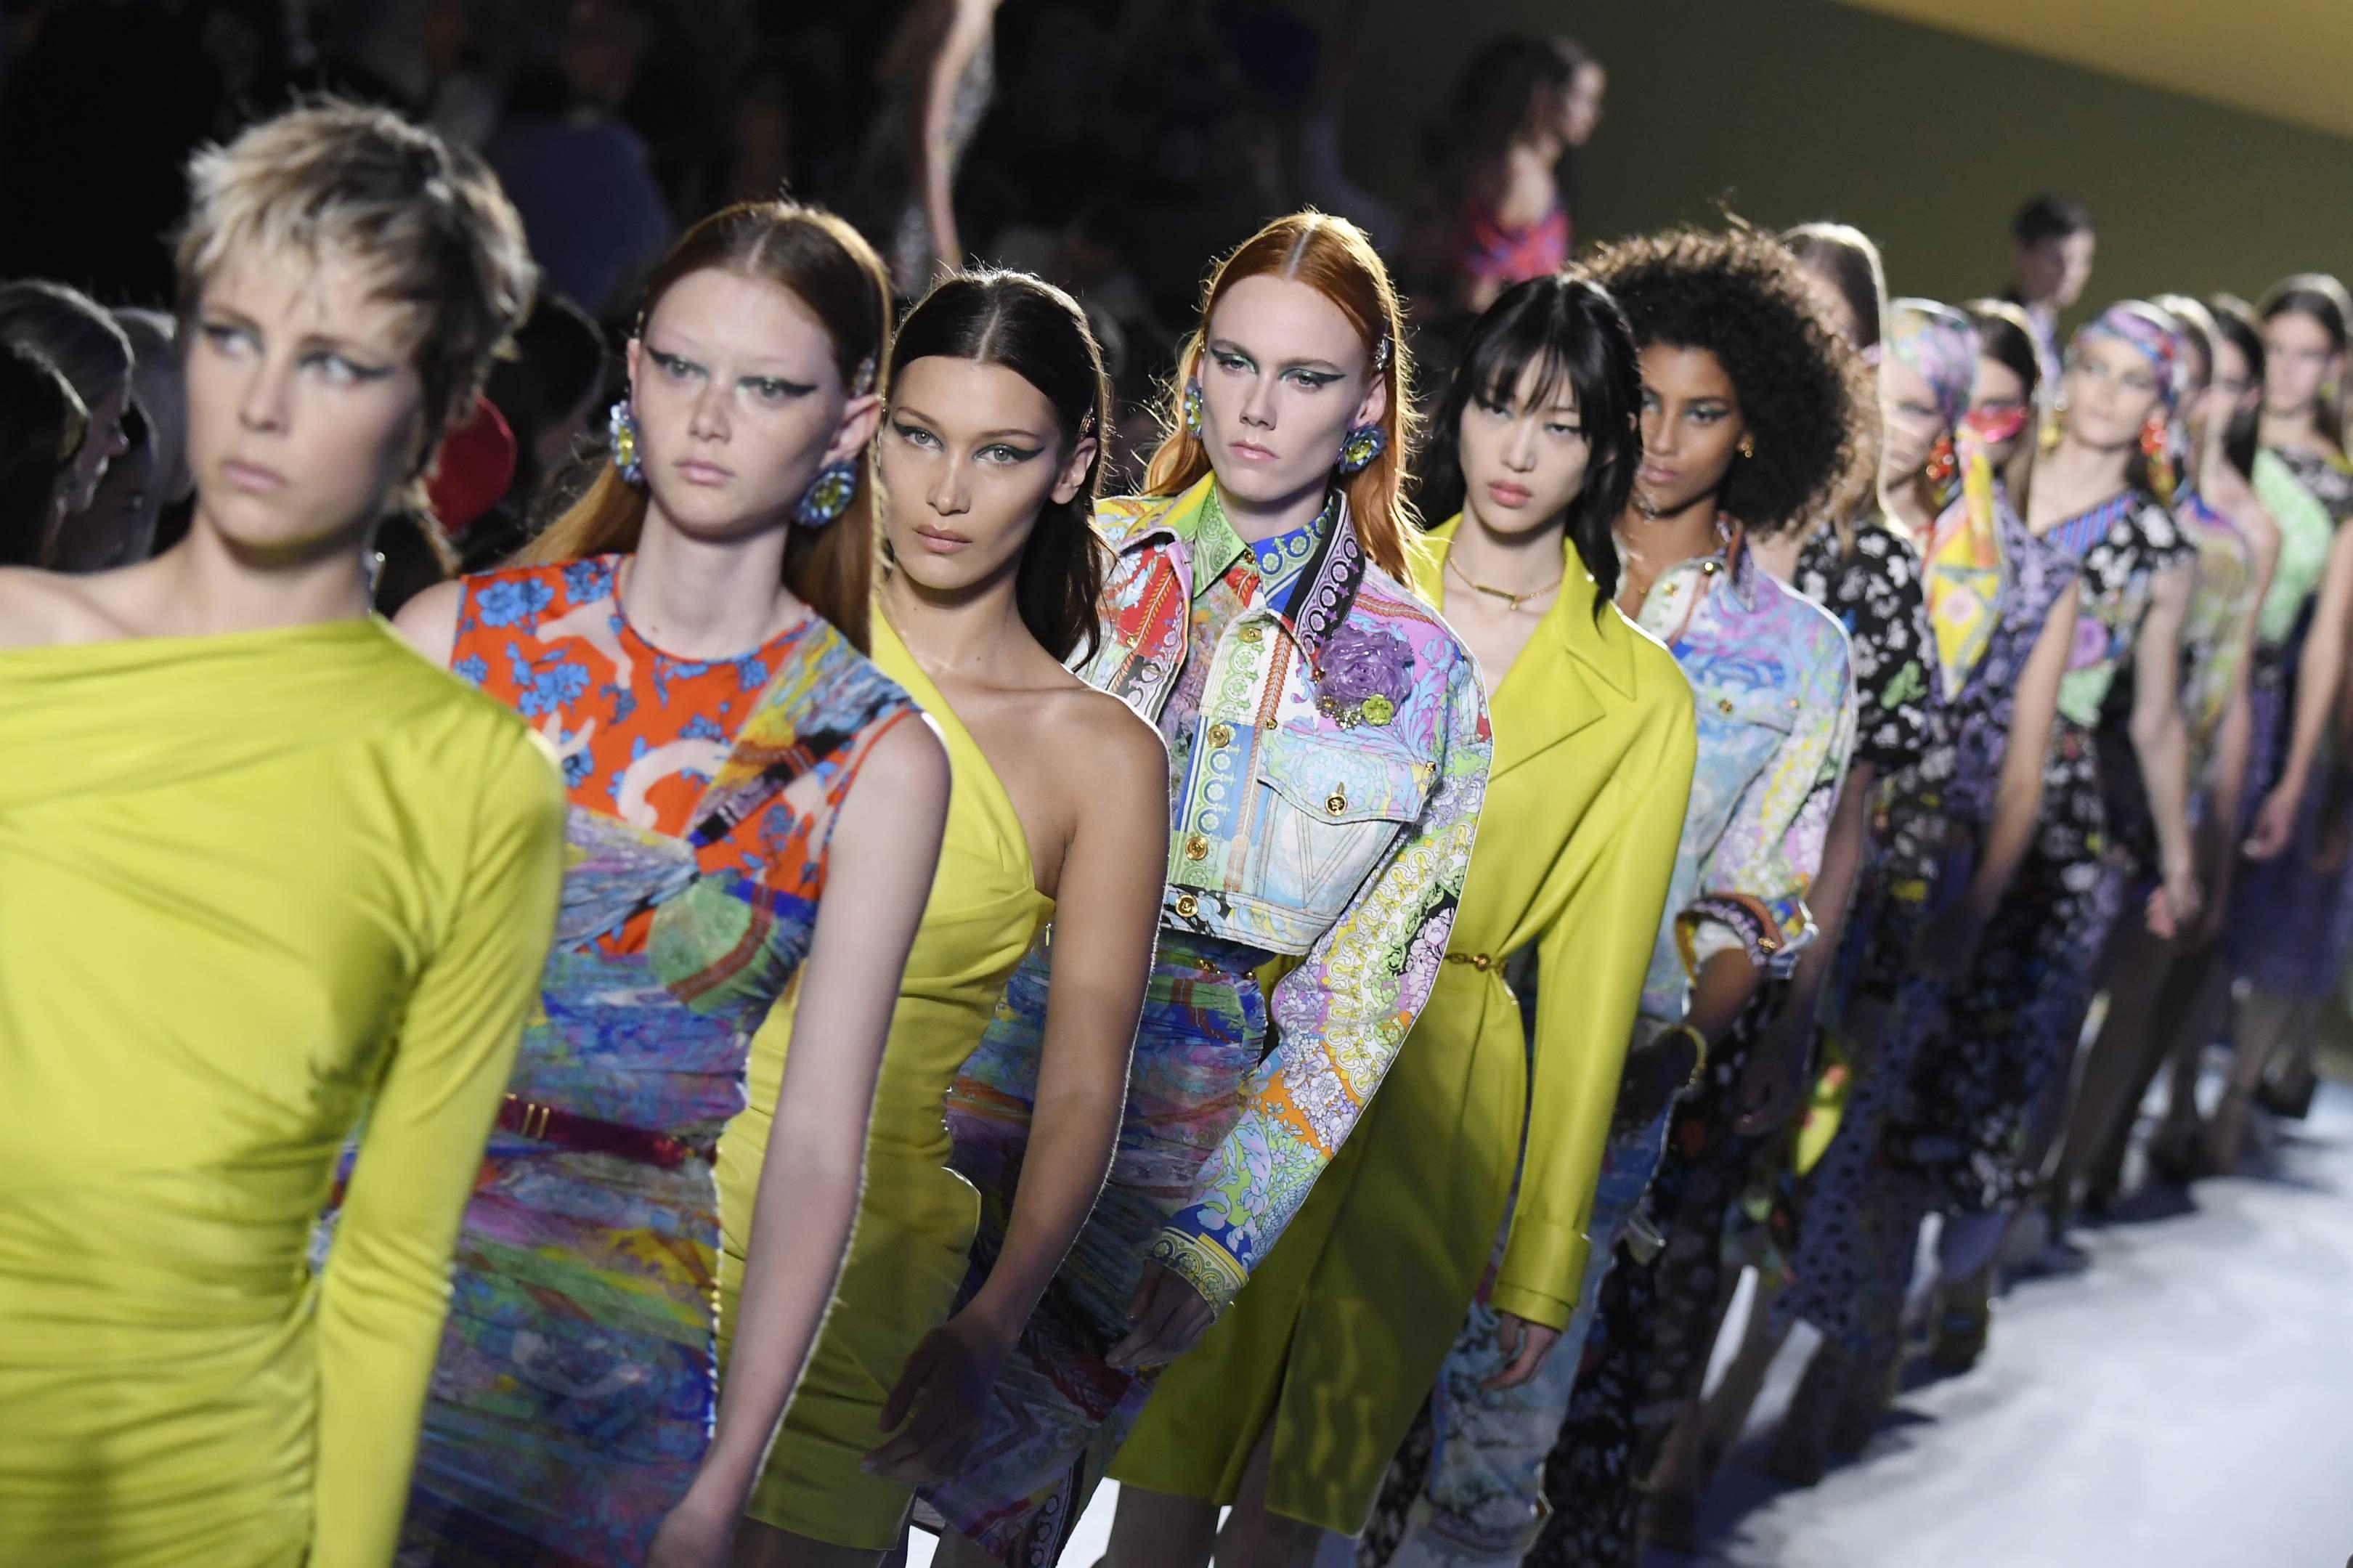 f28d6fb5dea4 Michael Kors Buys Versace For  2.1 Billion